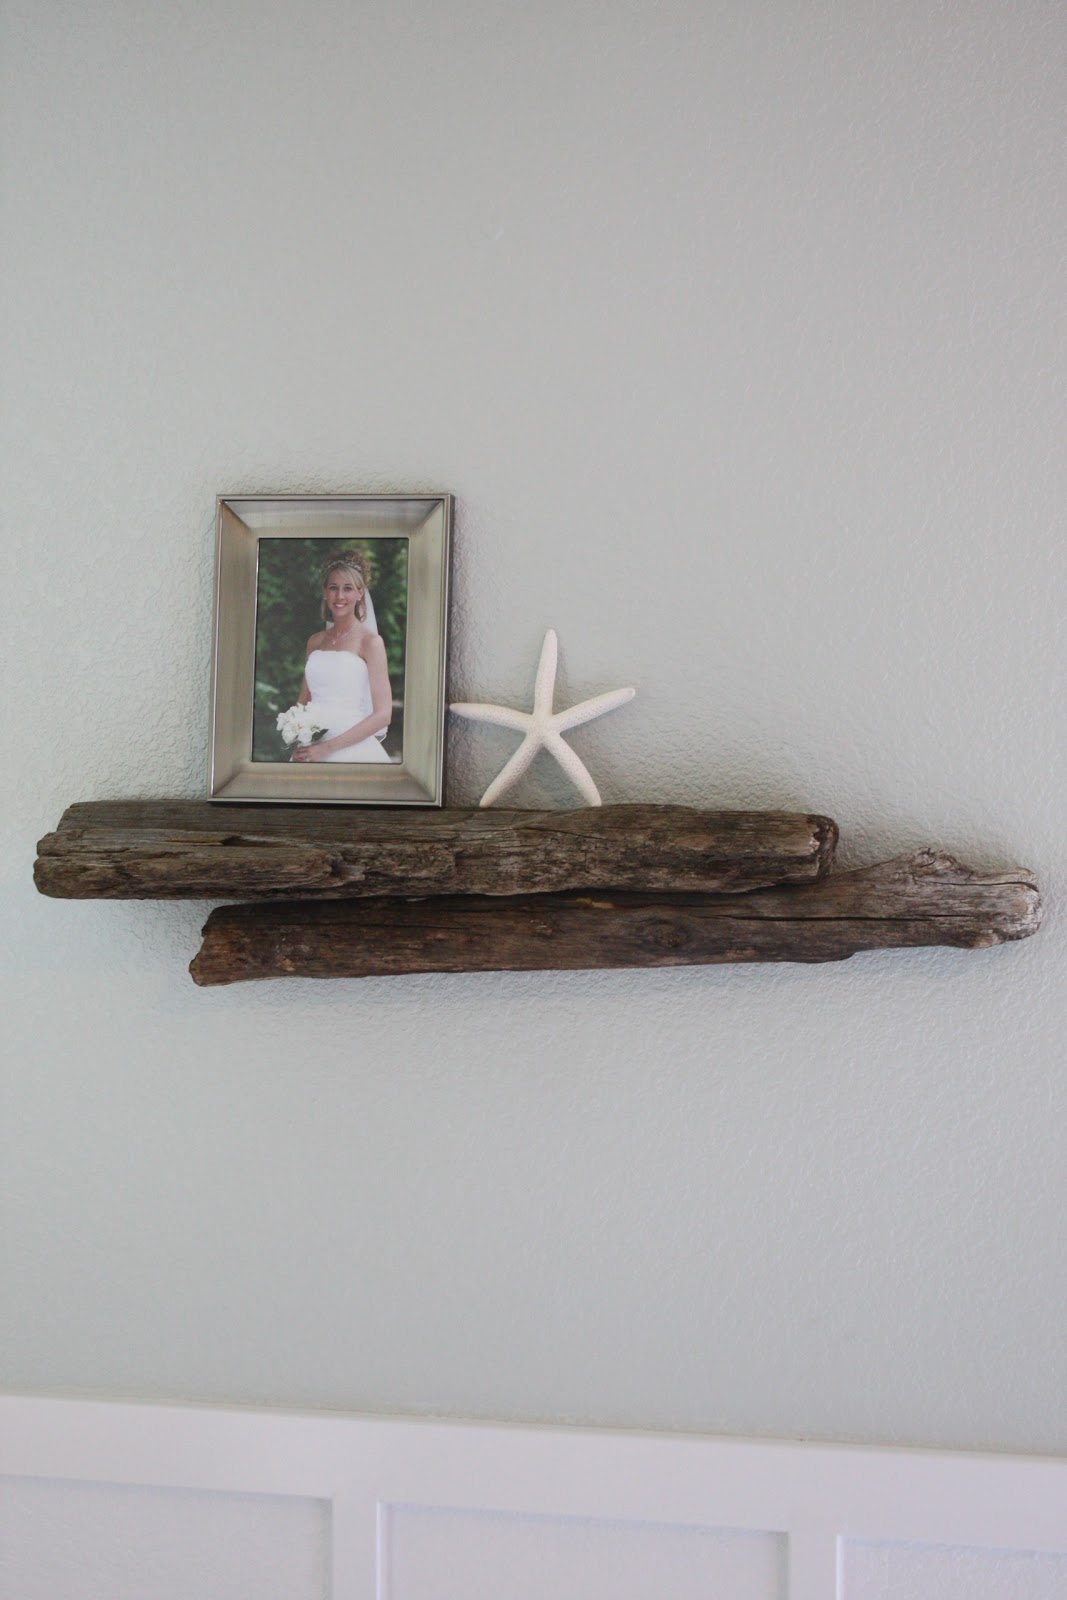 growing up gardner driftwood shelf master bedroom diy